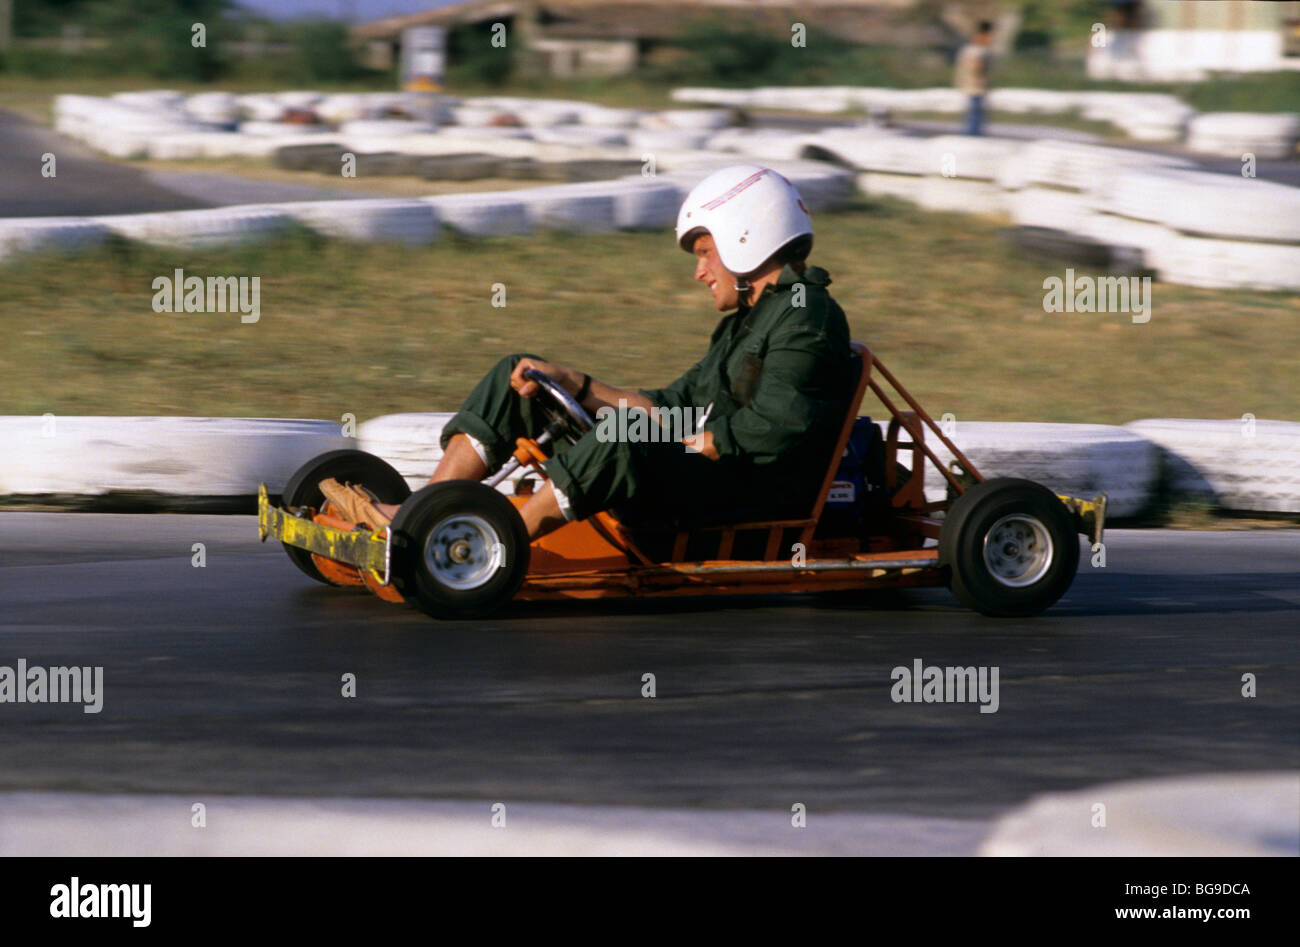 Man driving a go kart around a corner Stock Photo: 27252970